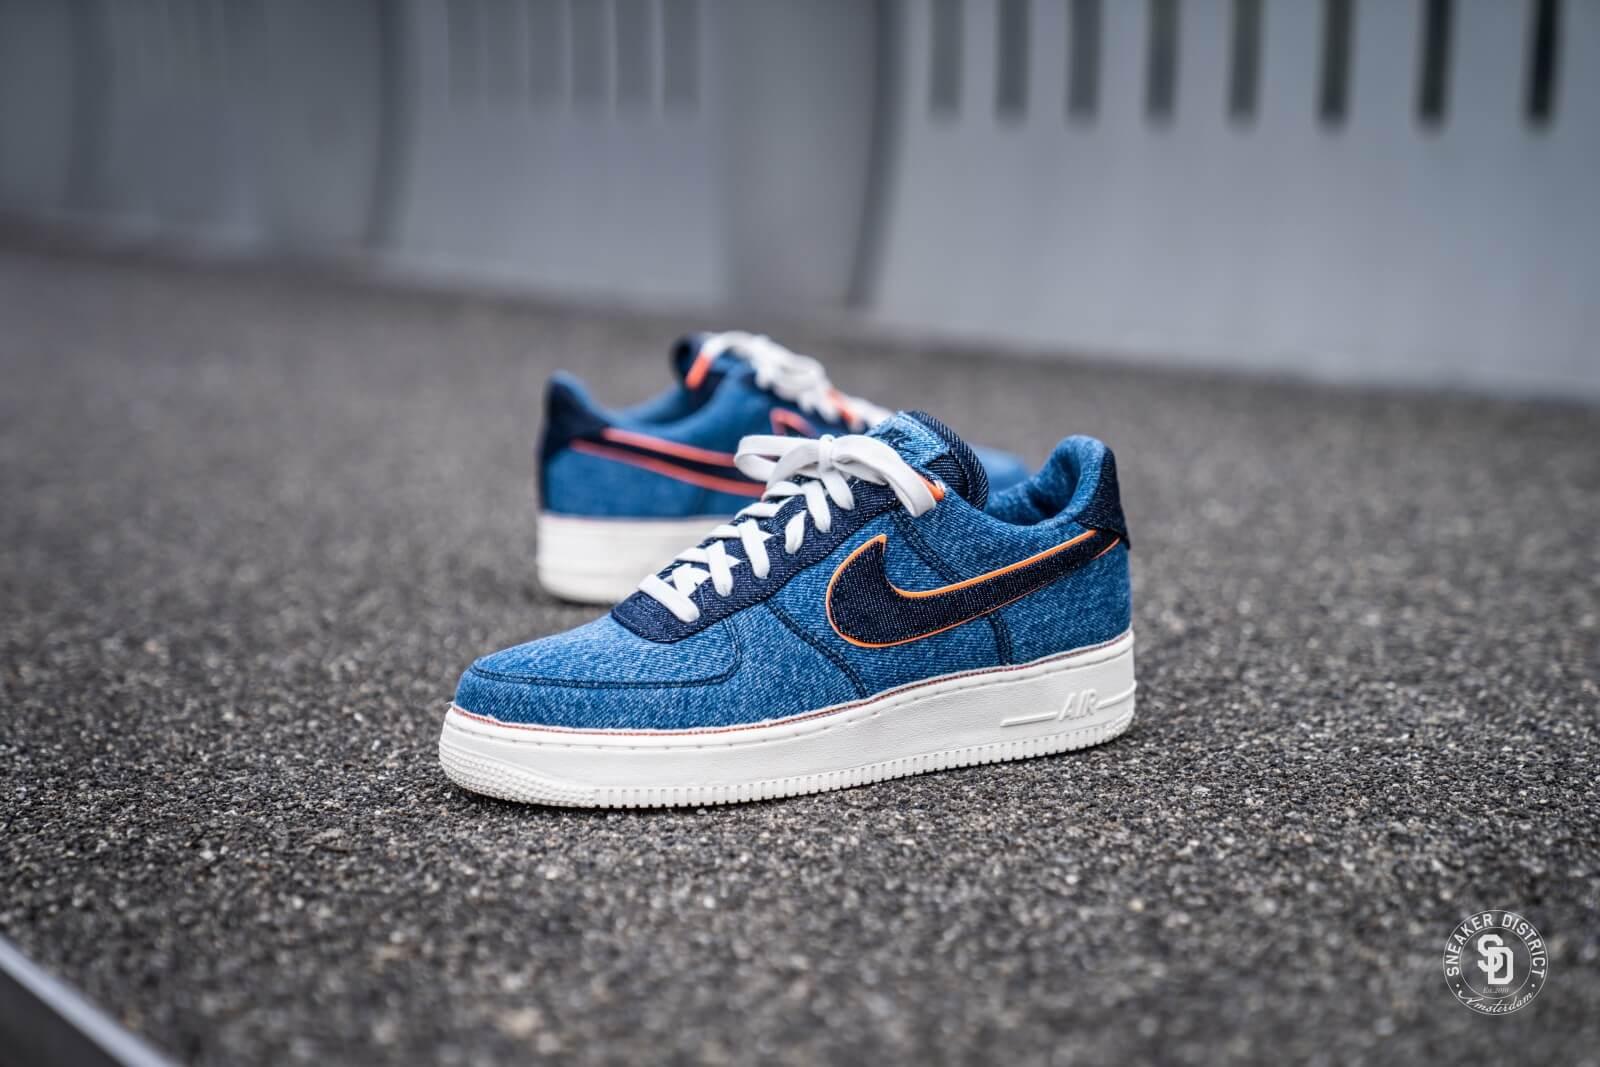 Nike Air Force 1 '07 Premium Stonewash